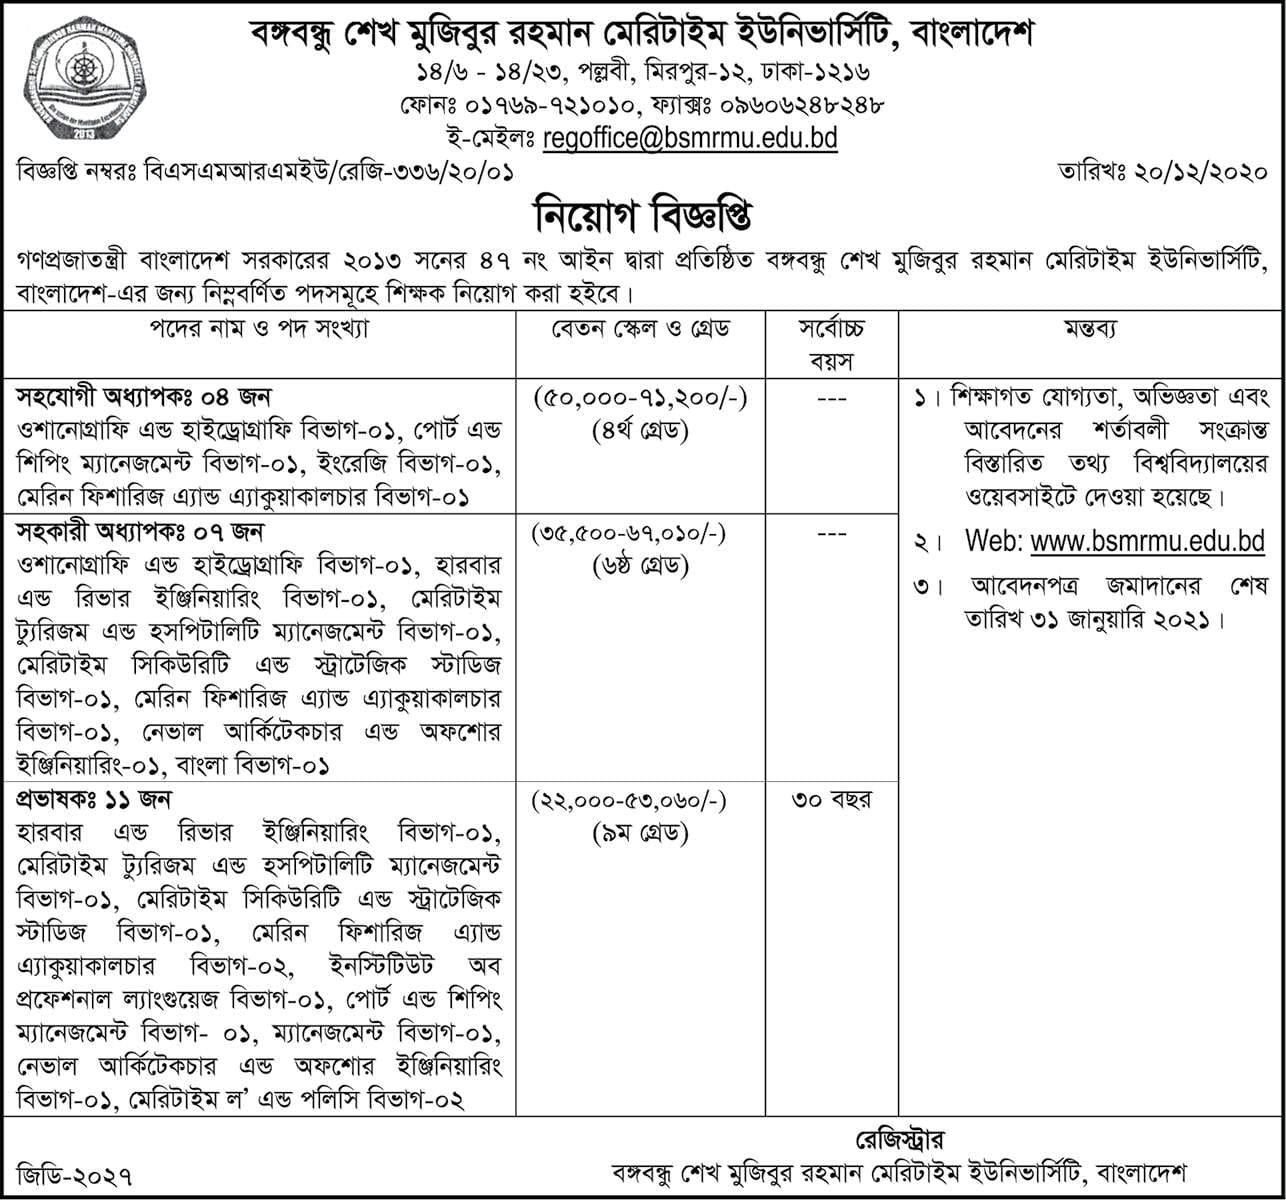 Bangabandhu Sheikh Mujibur Rahman Maritime University Job Circular